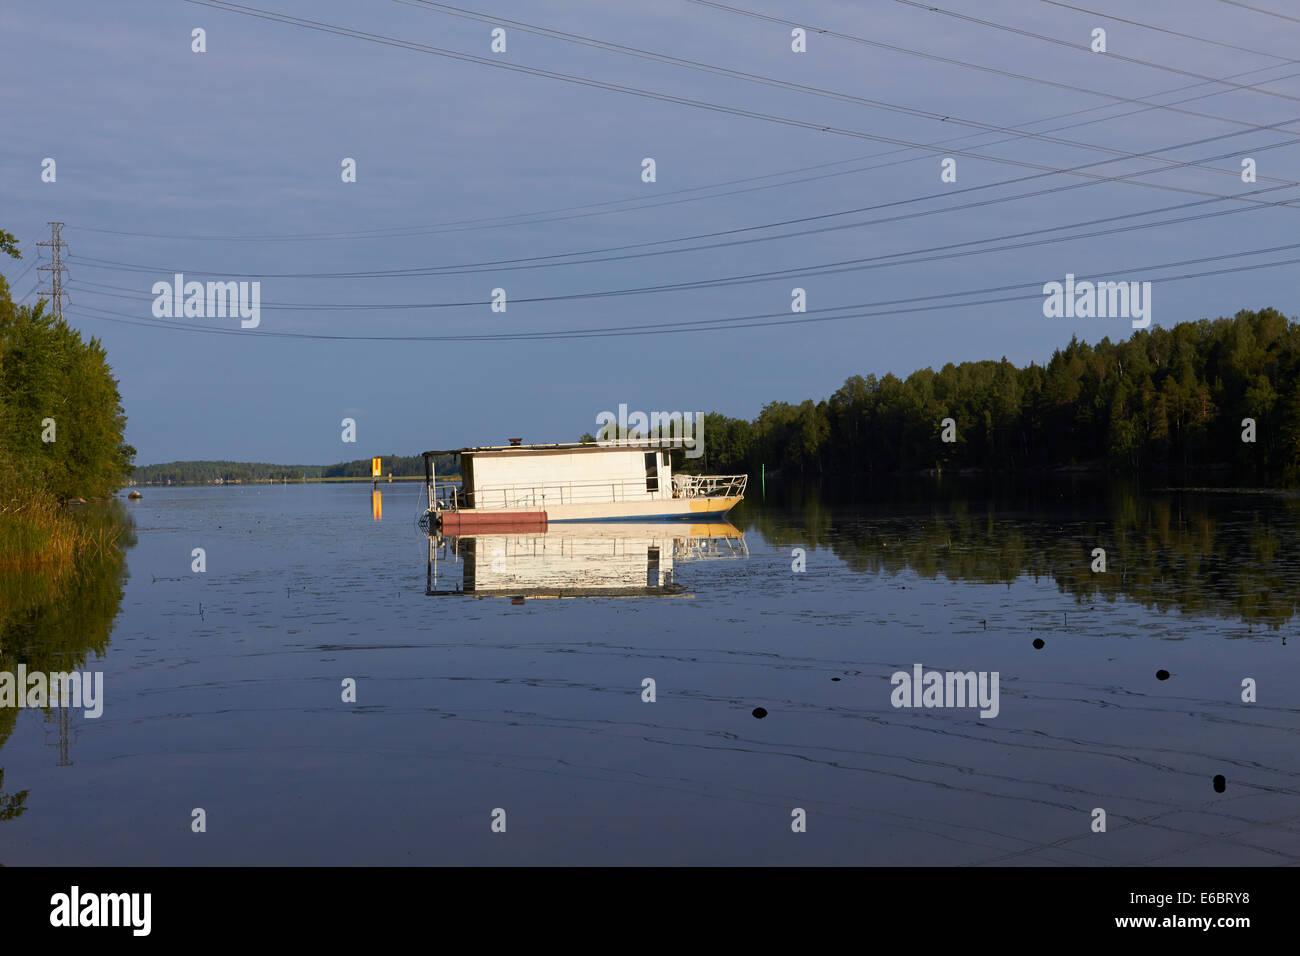 anchored house boat in Lappeenranta Finland - Stock Image